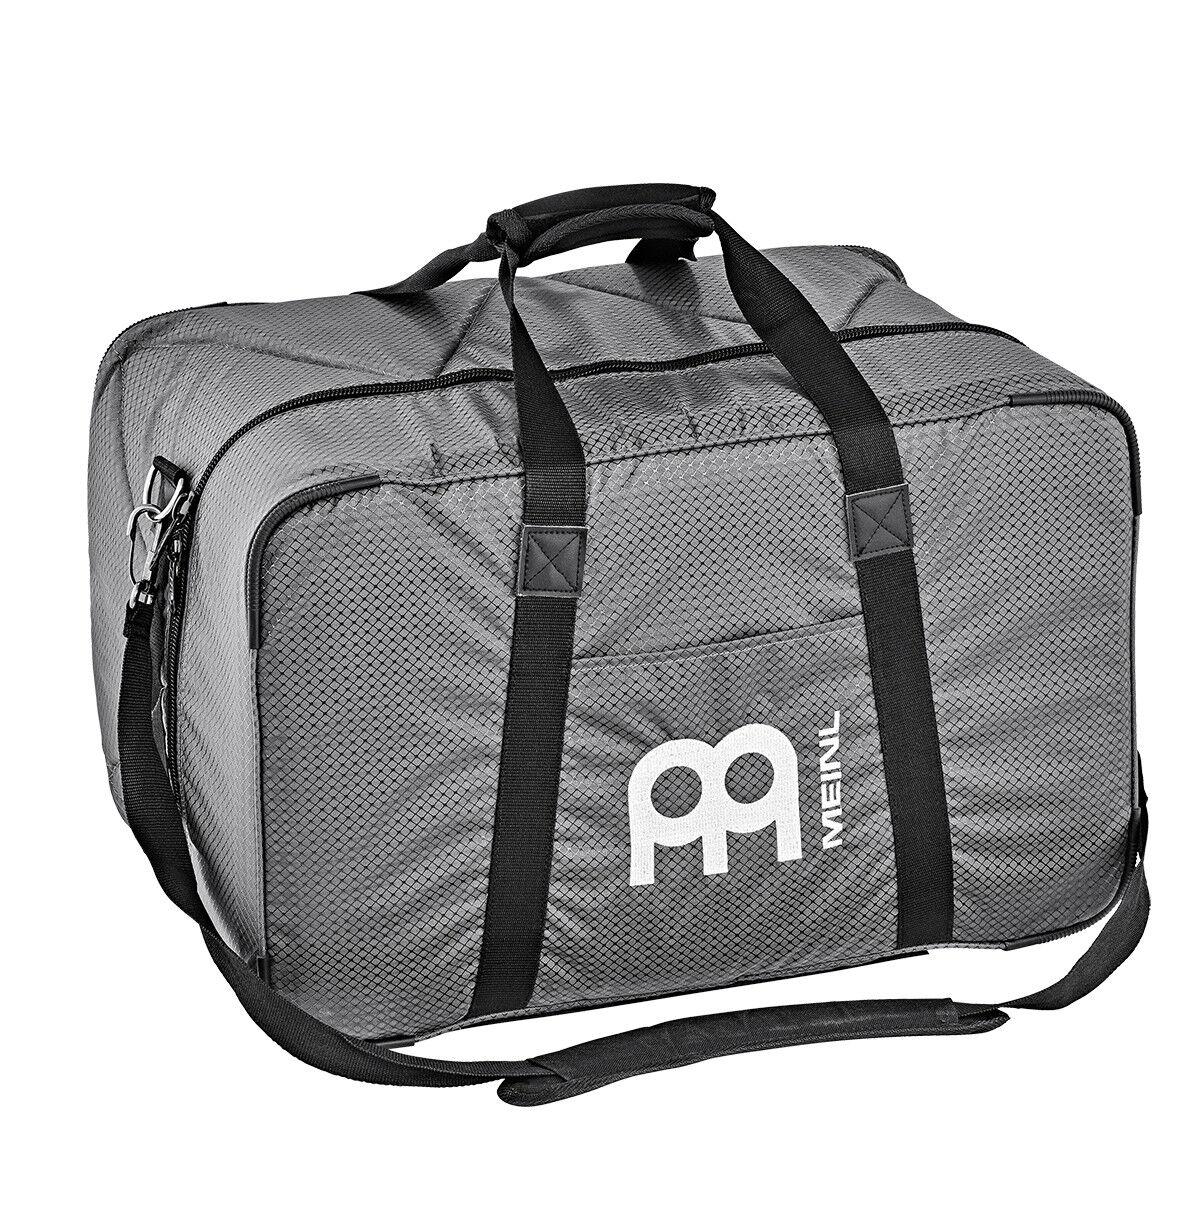 Meinl MCJB-CG Standard Professional Cajon Bag